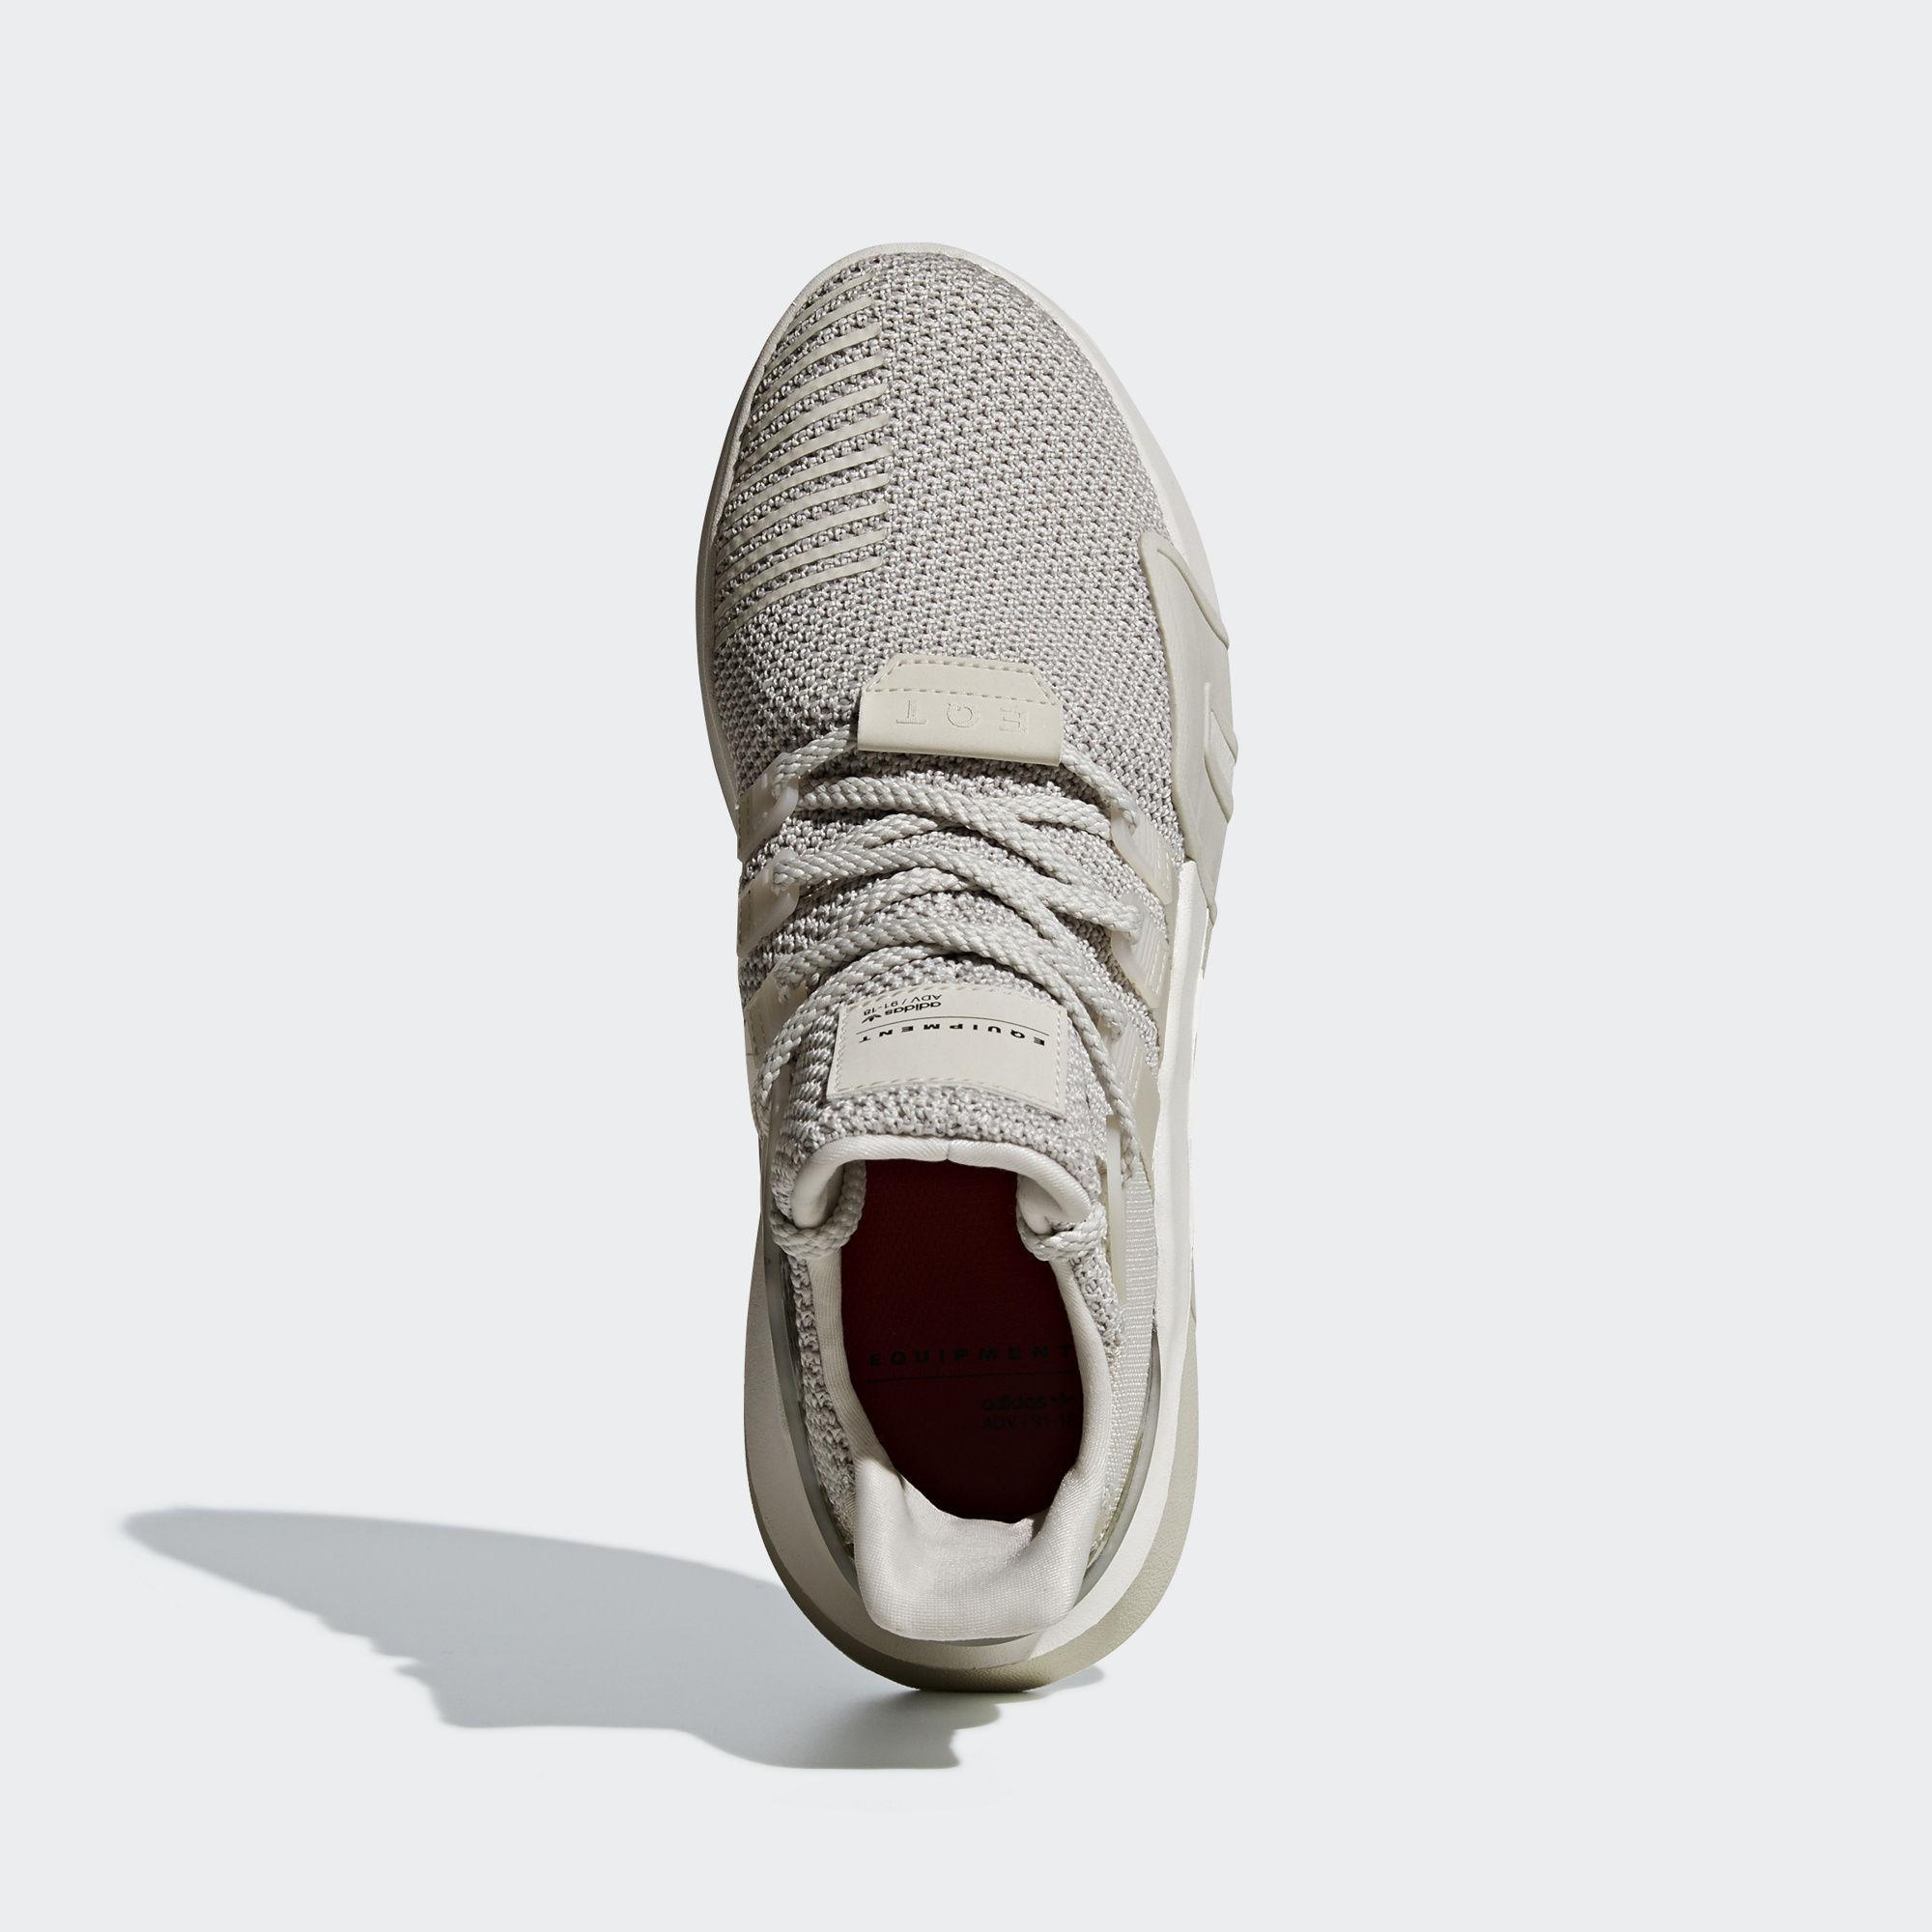 e0a7f52c9e35 Adidas - White Eqt Bask Adv Shoes for Men - Lyst. View fullscreen